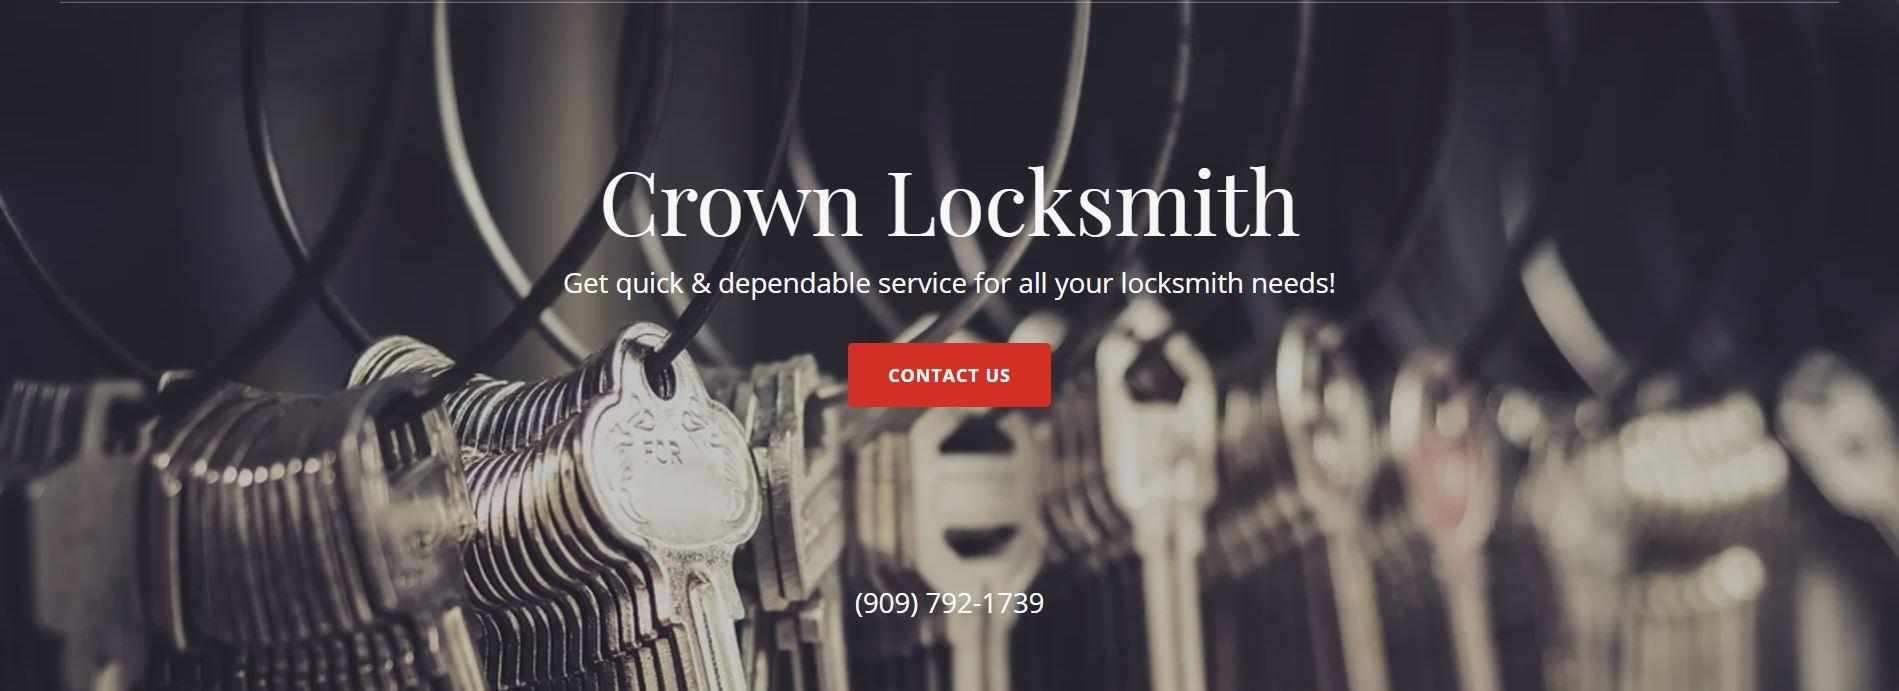 Crown Locksmith Servi (@crownlocksmithservices) Cover Image